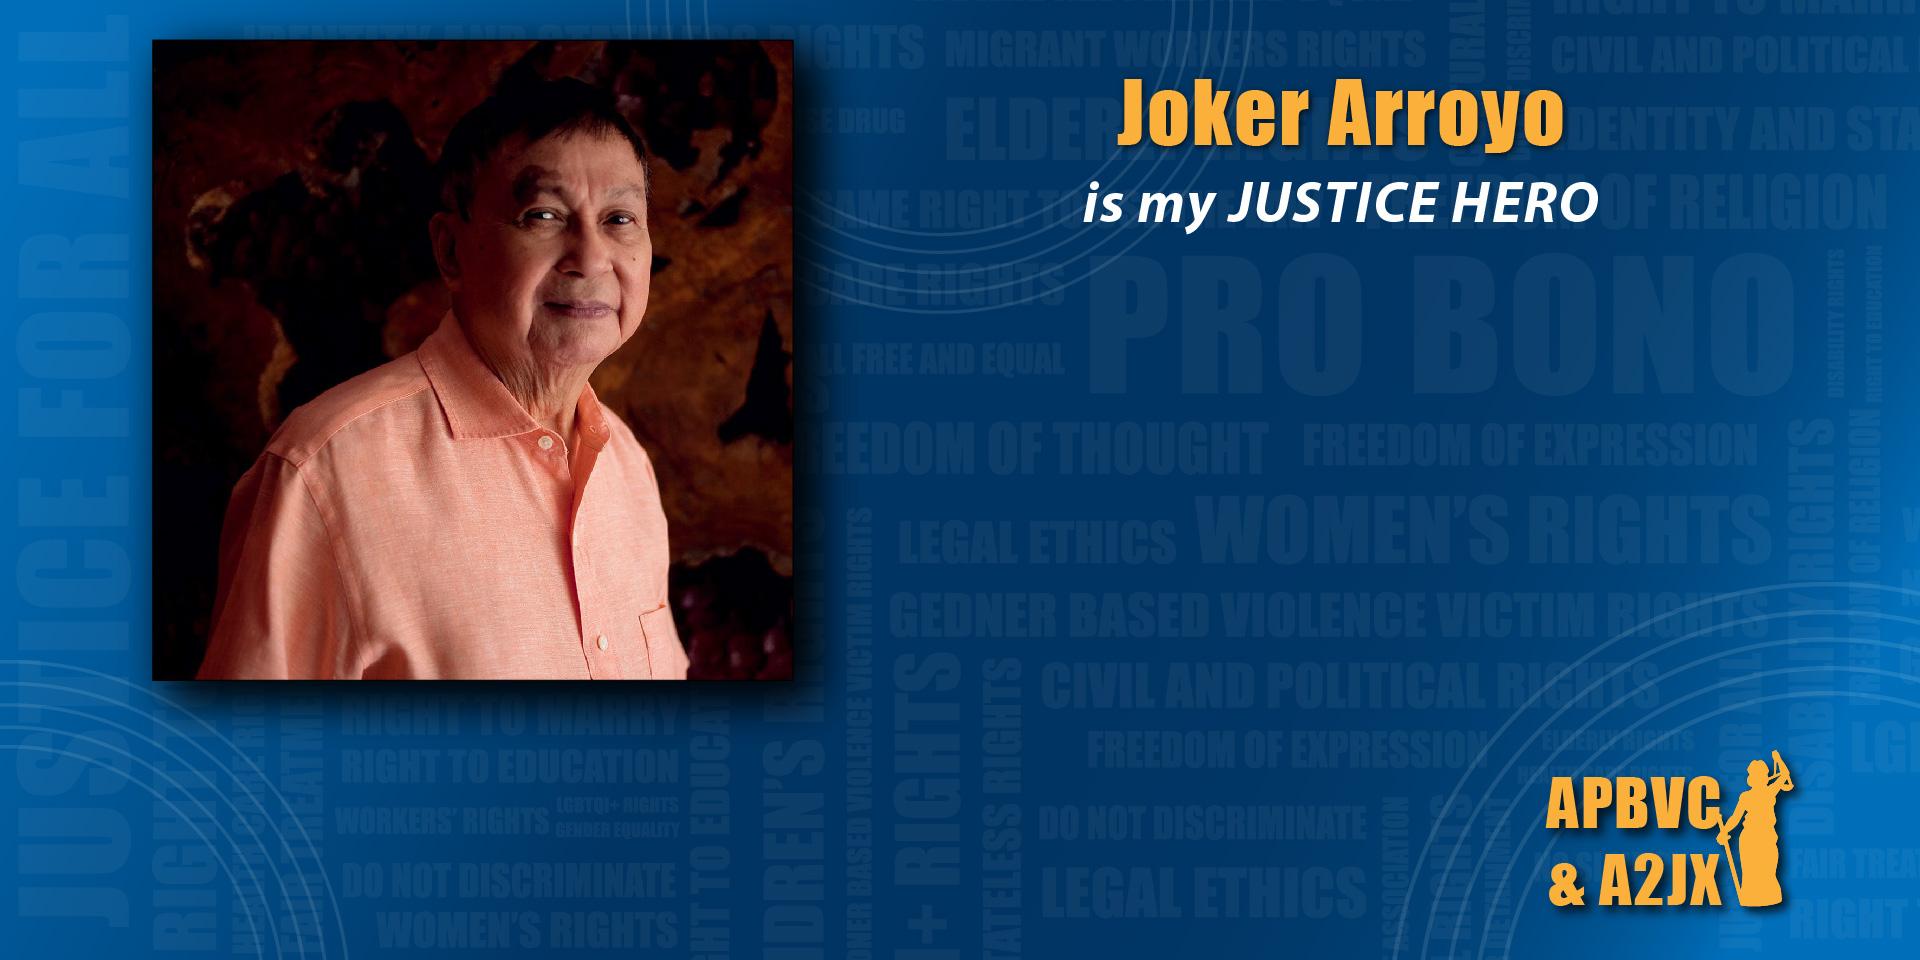 Joker Arroyo